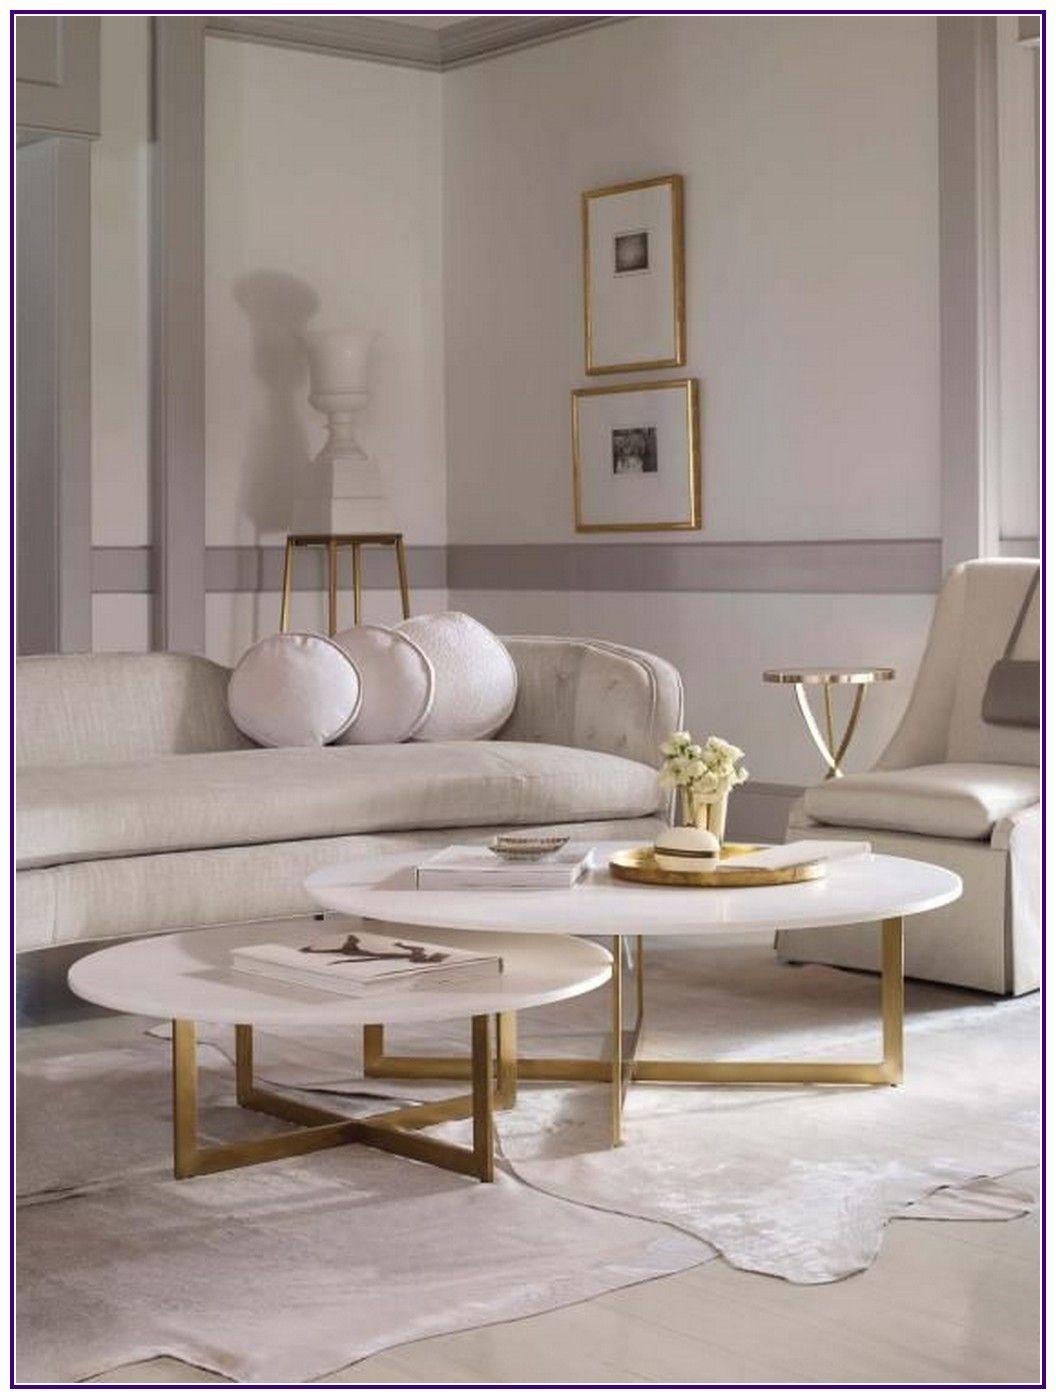 14 Inspiring Ottoman Coffee Table Design Ideas 00013 Winzipdownload Org Table Decor Living Room Marble Tables Living Room Living Room Table [ 1399 x 1056 Pixel ]